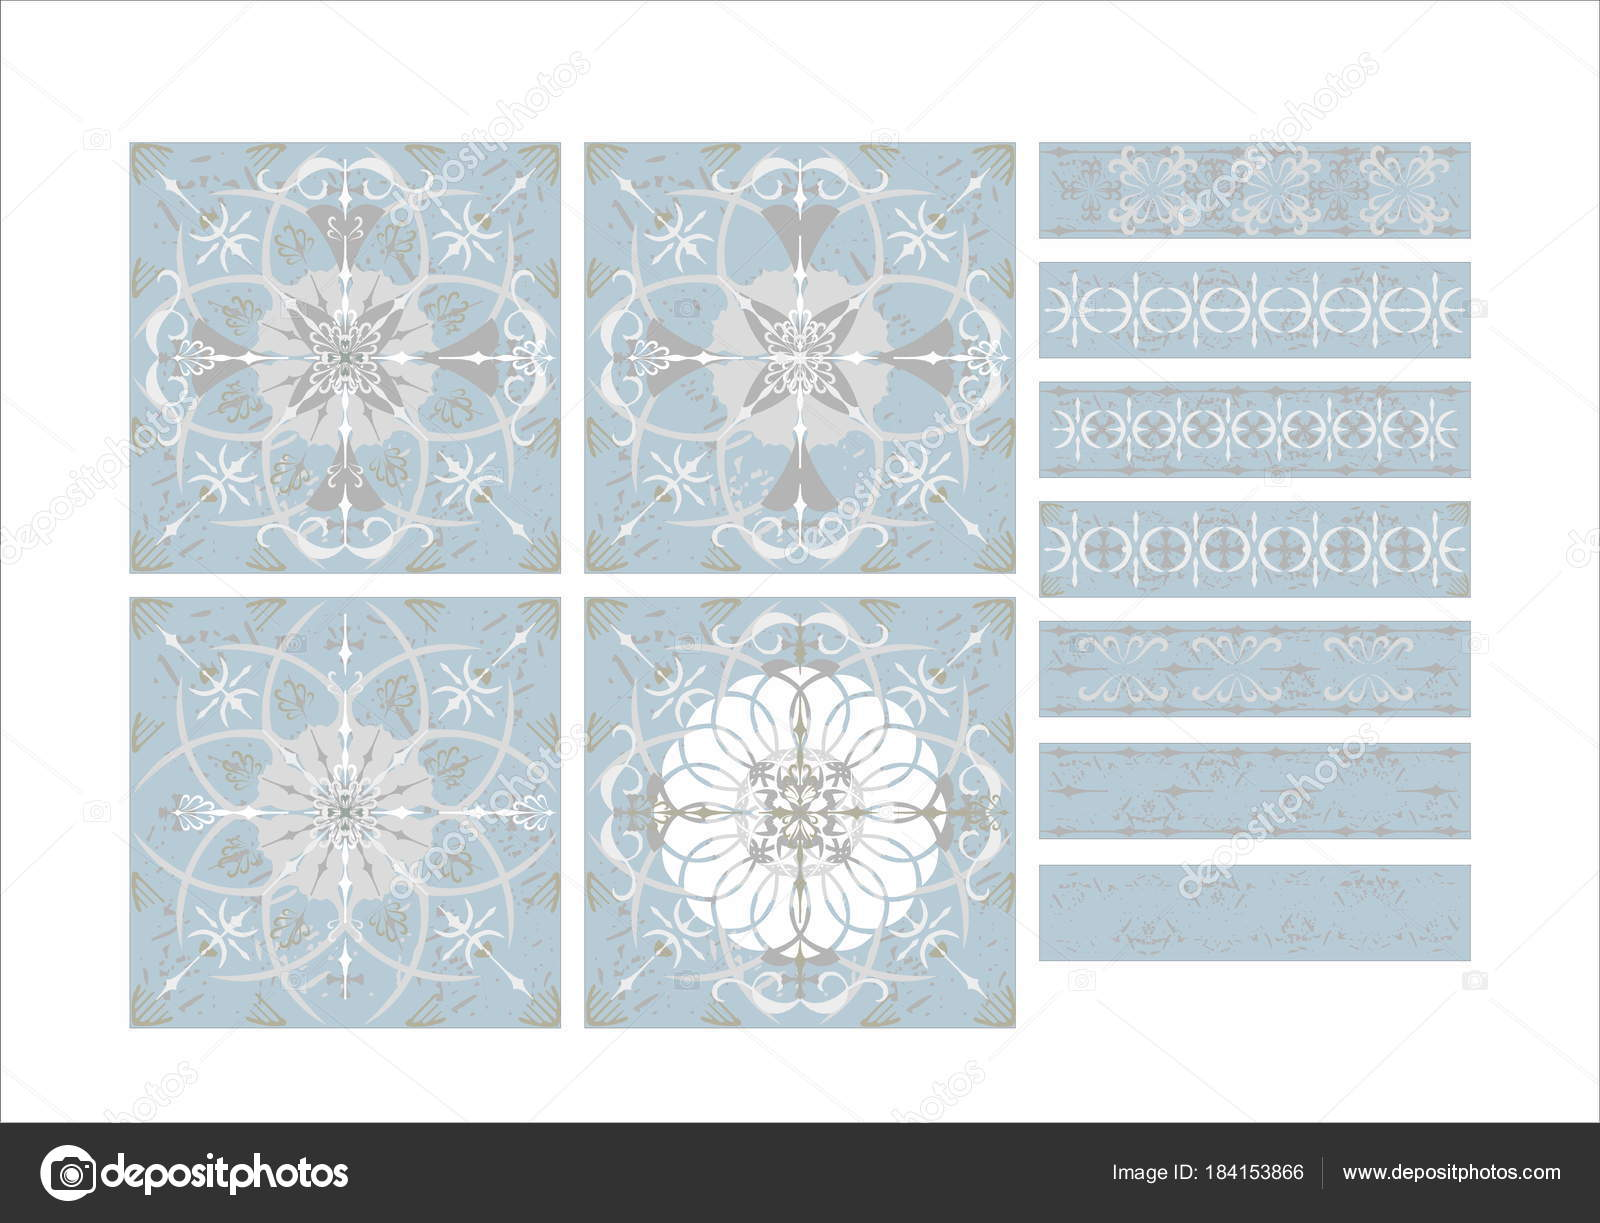 Salle De Bain Azulejos ~ antique arabesque arabe abstrait architecture art artistique